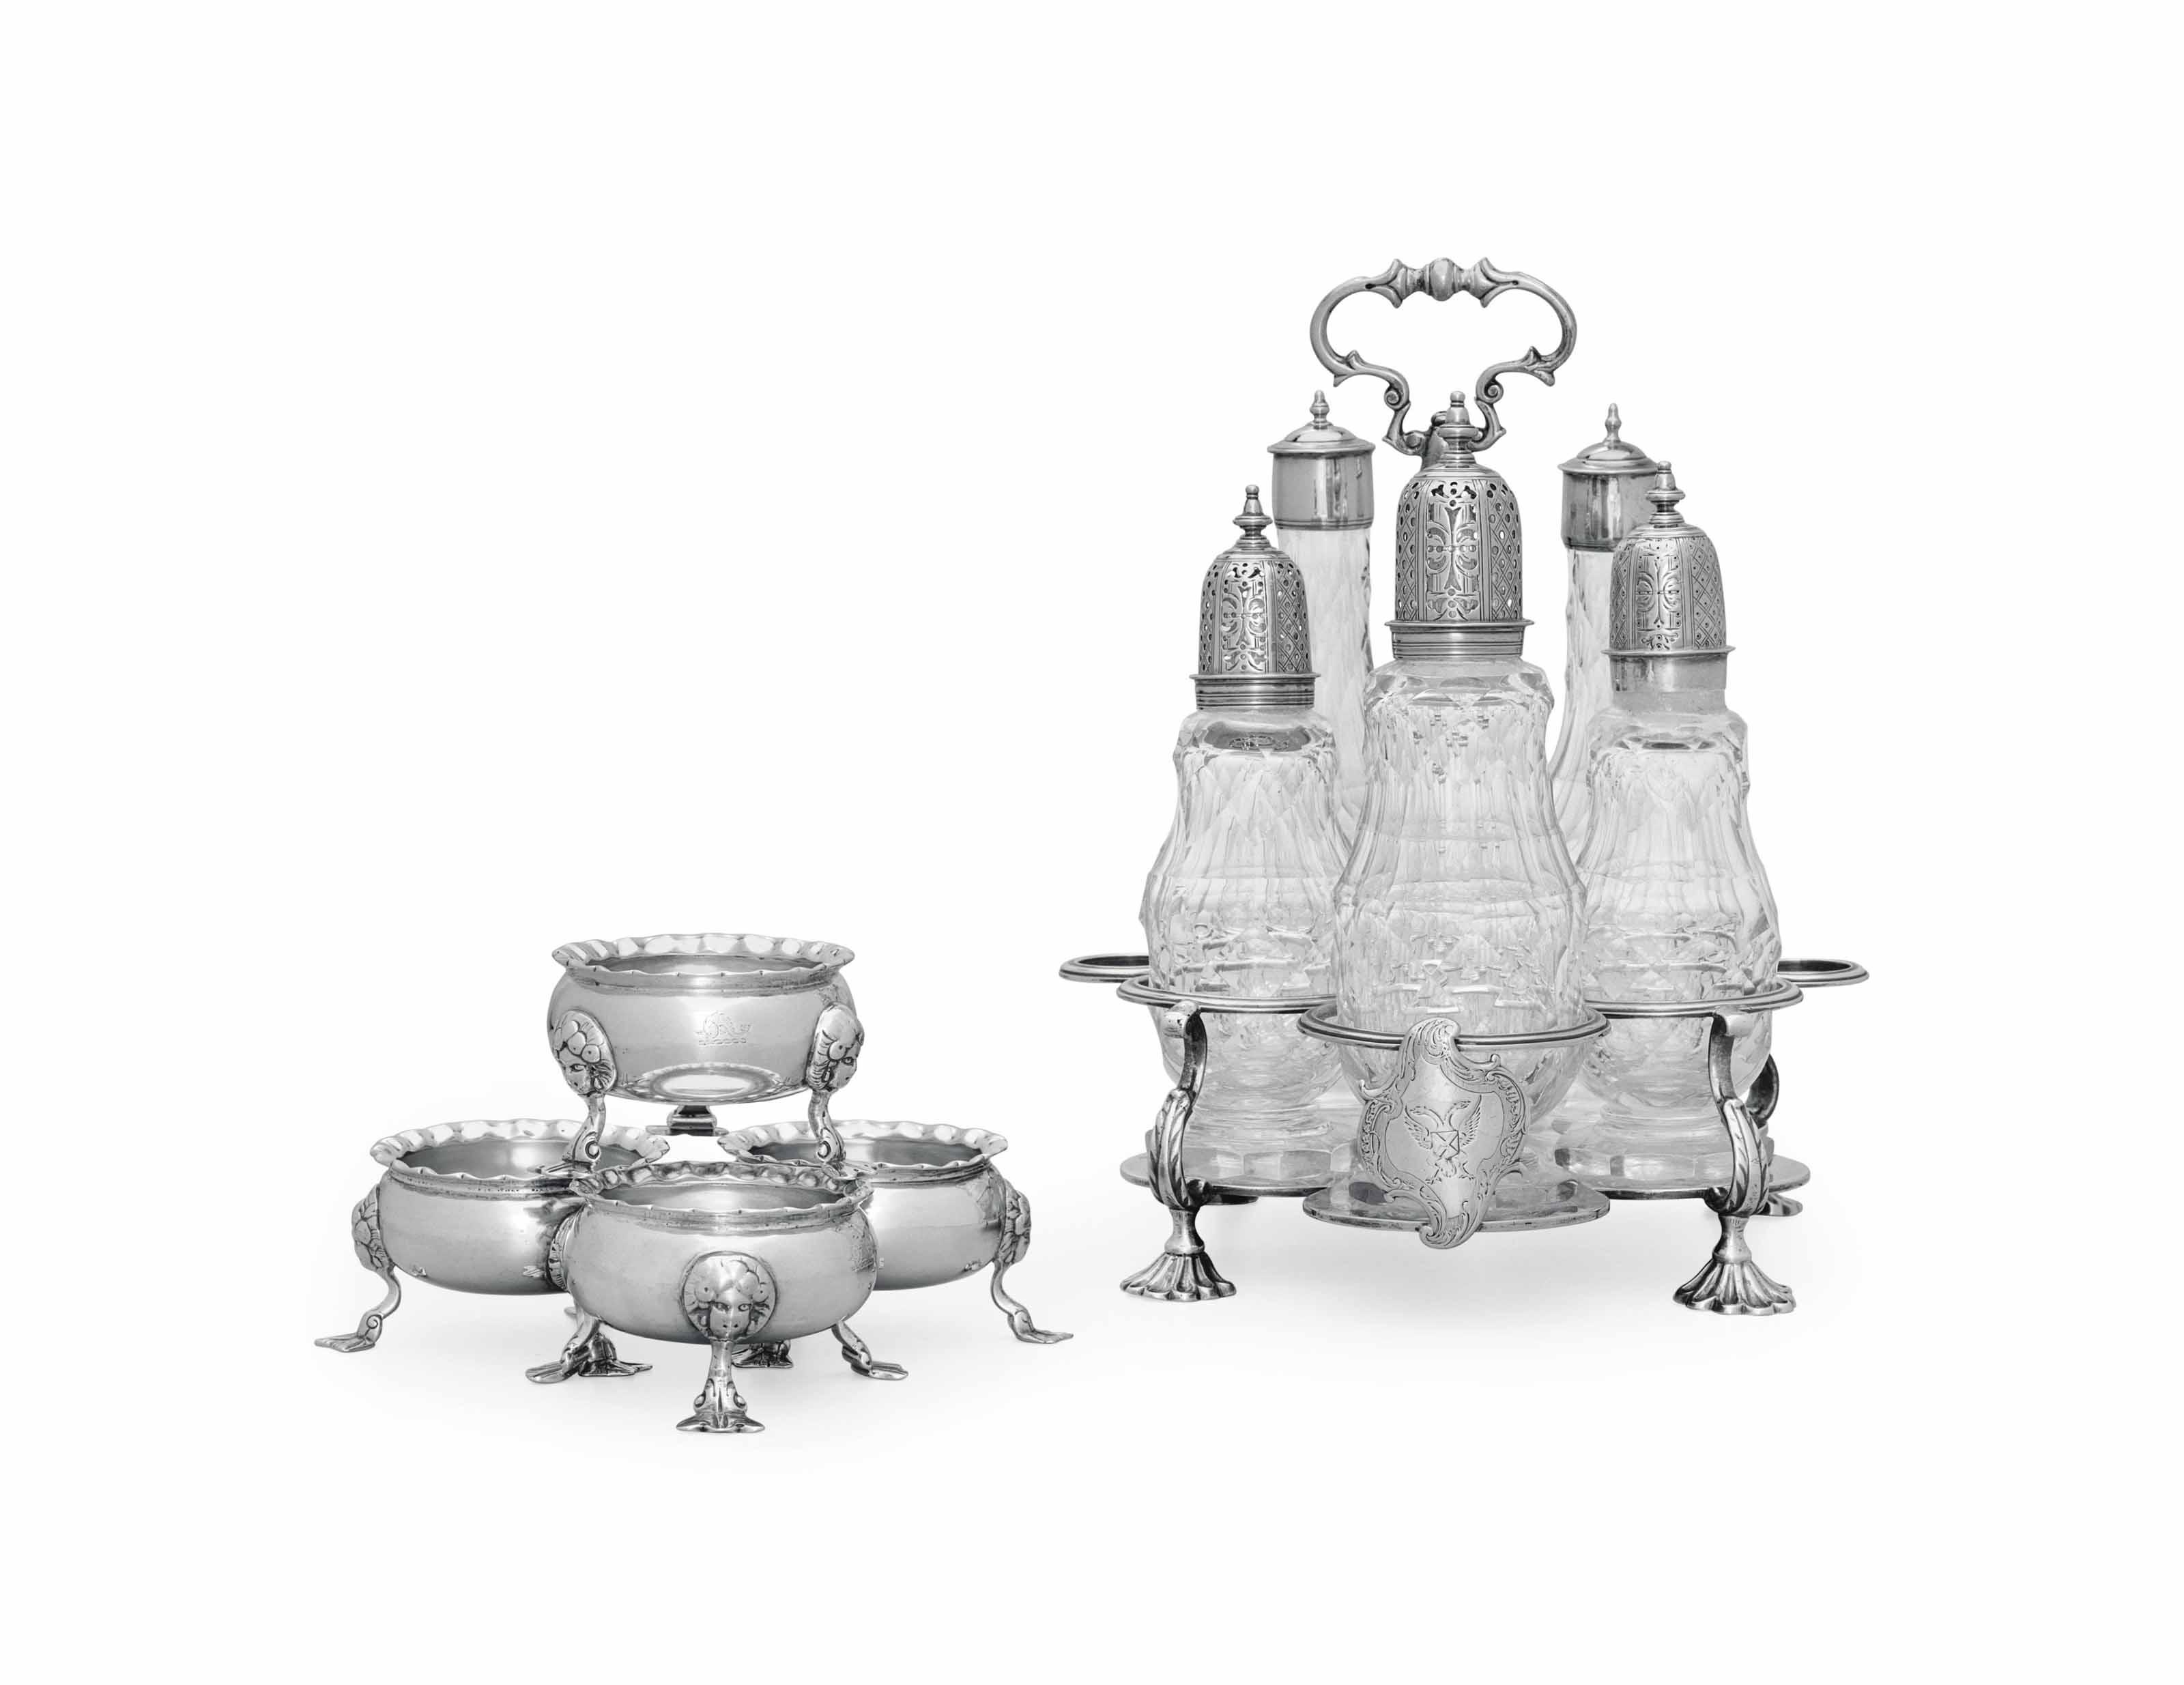 A GEORGE II SCOTTISH SILVER WARWICK CRUET AND A SET OF FOUR SILVER SALT CELLARS